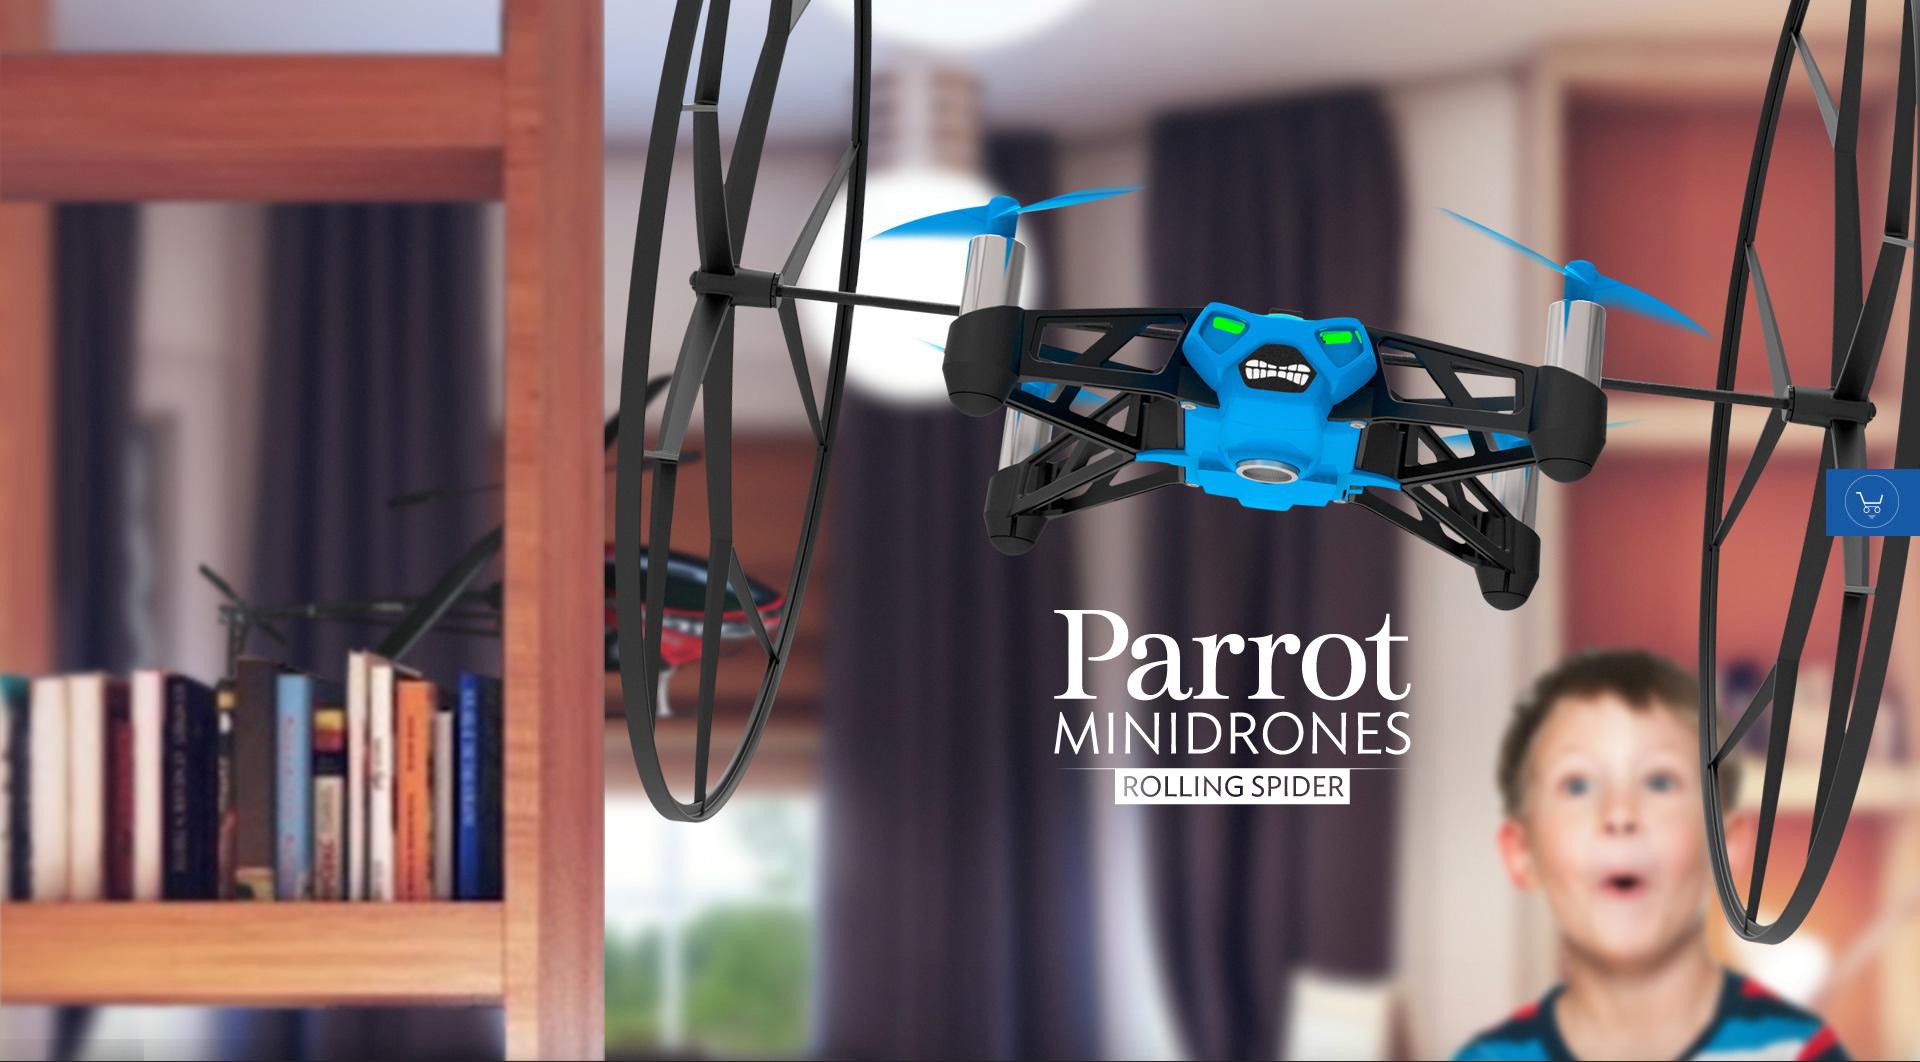 Dronele Parrot Rolling Spider și Jumping Sumo, disponibile la Orange